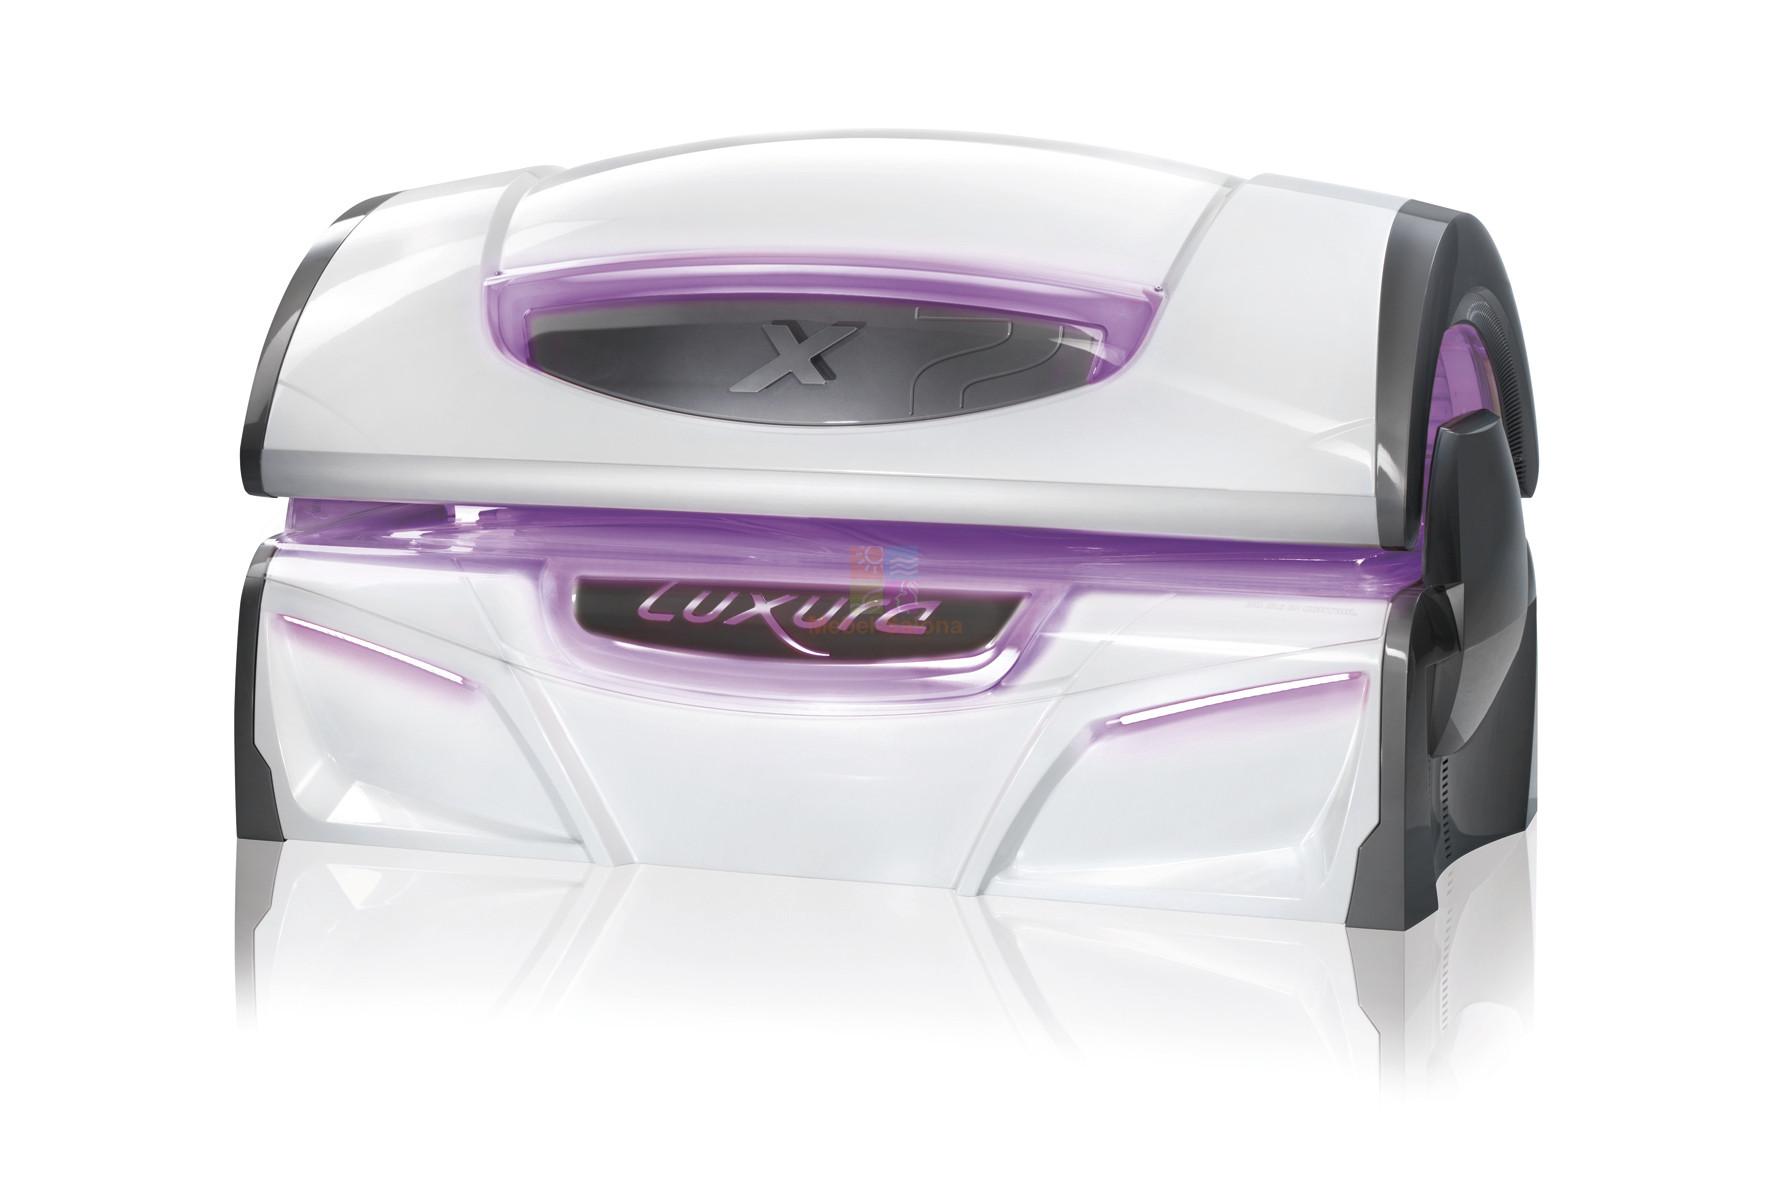 Cолярий горизонтальный Hapro Luxura X7 II 42 Sli High Intensive ультрамарин